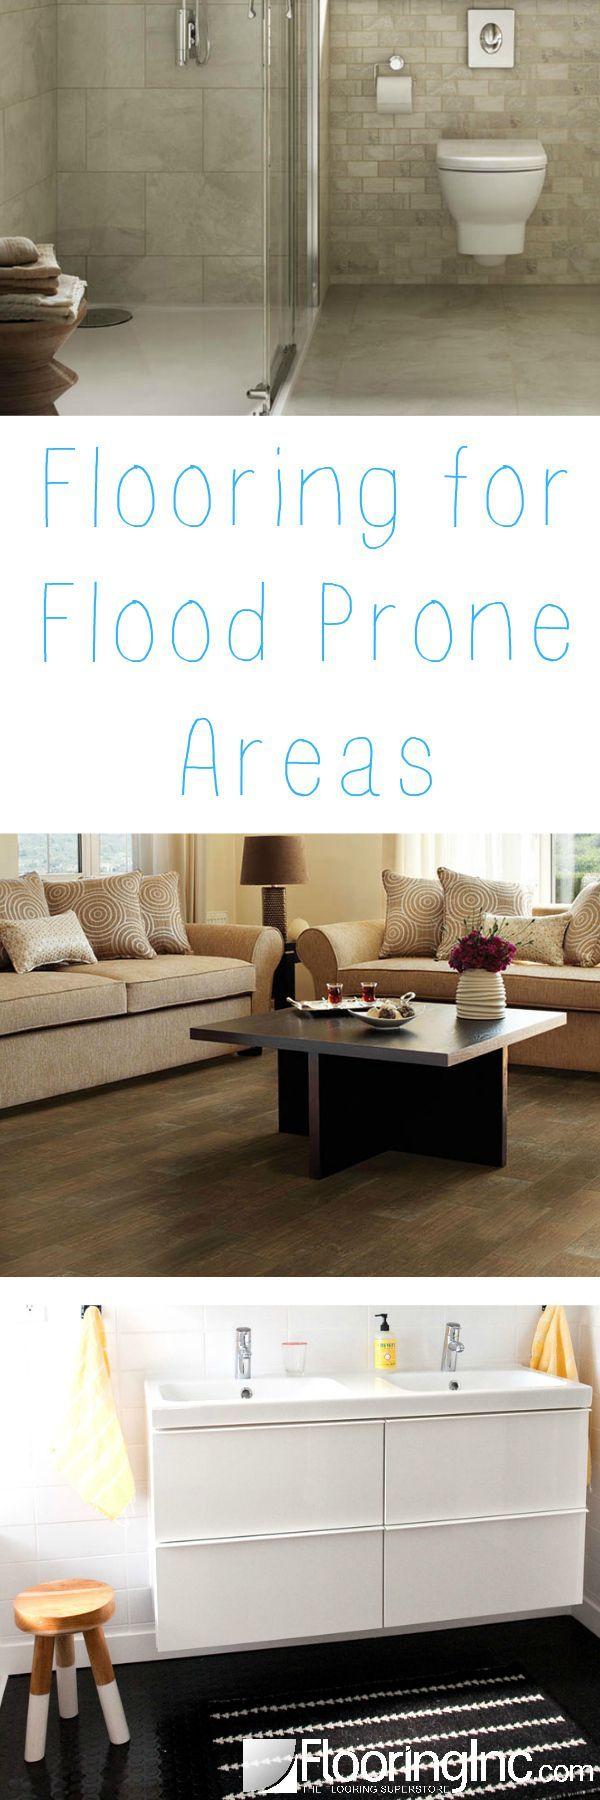 Rubber floor mats for basement - Flooring For Flood Prone Areas